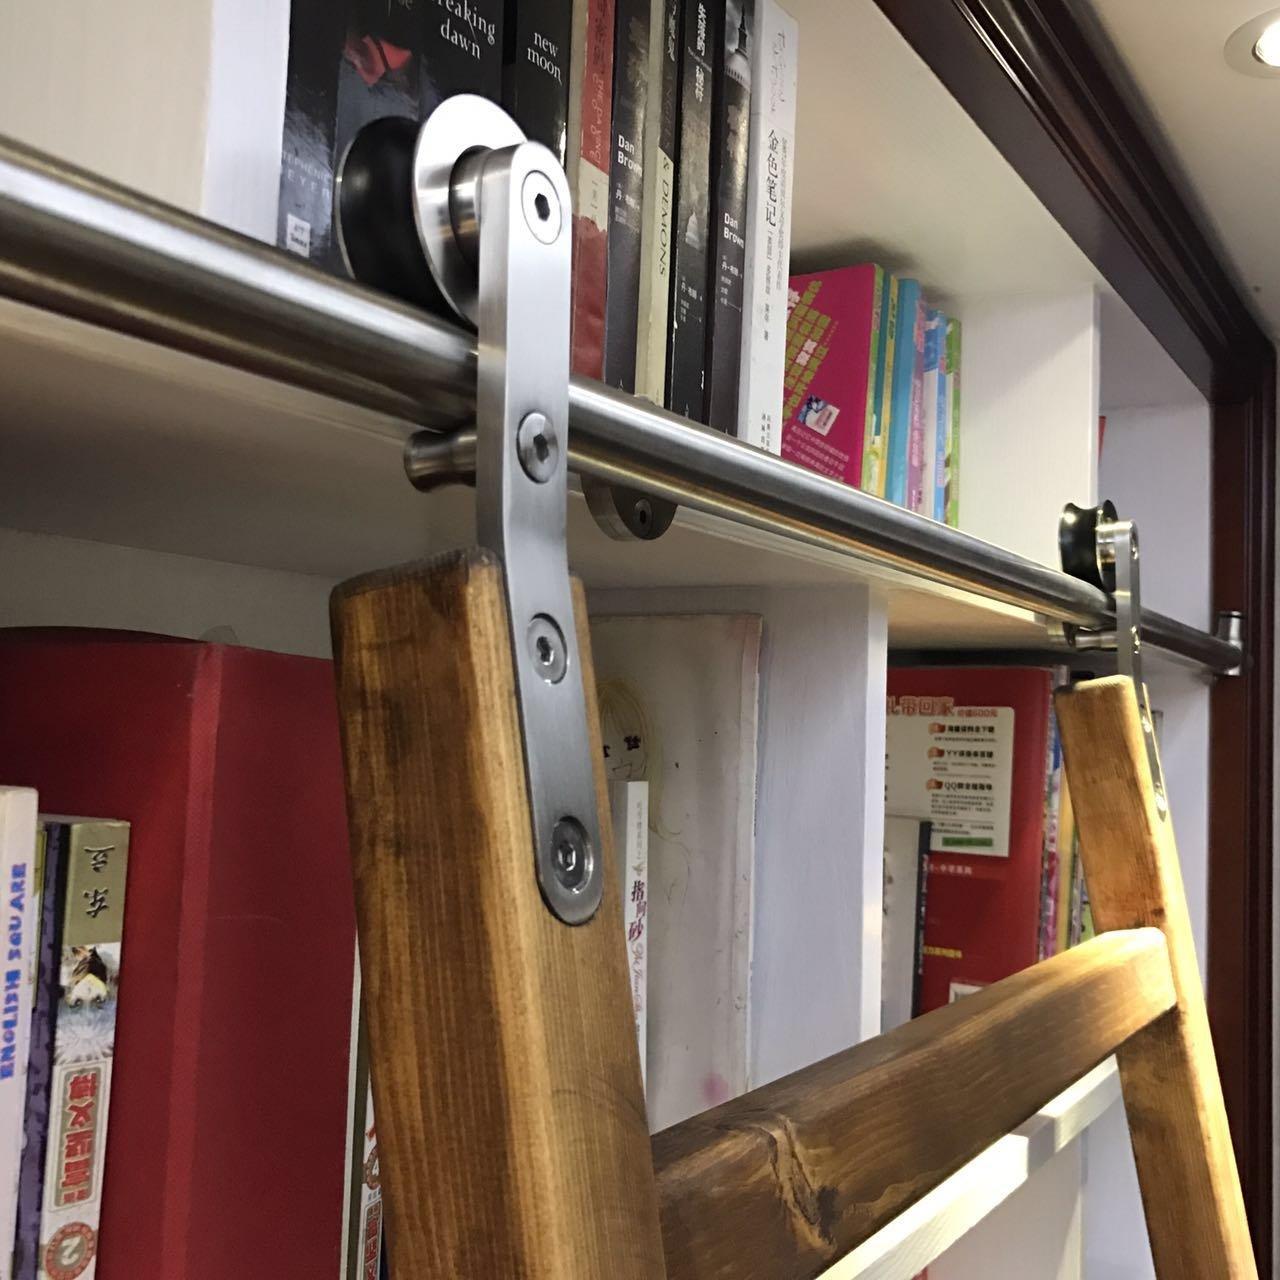 DIYHD 12FT Stainless Steel Sliding Library Ladder Hardware(No ladder)